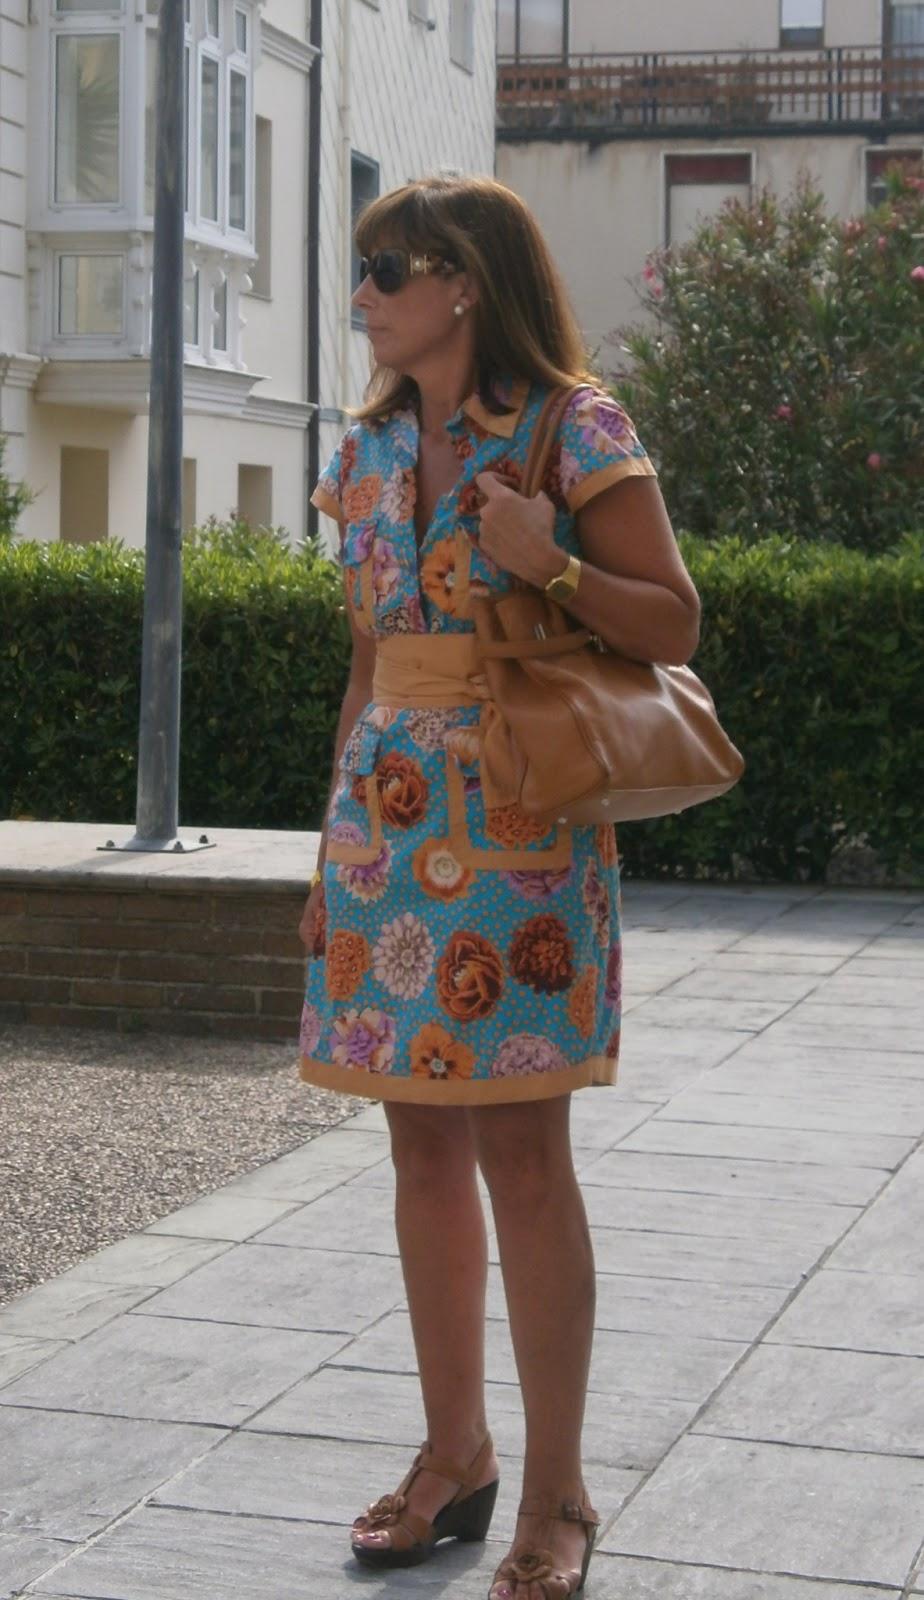 Br jula de estilo mis looks vestido flores - Brujula de estilo ...